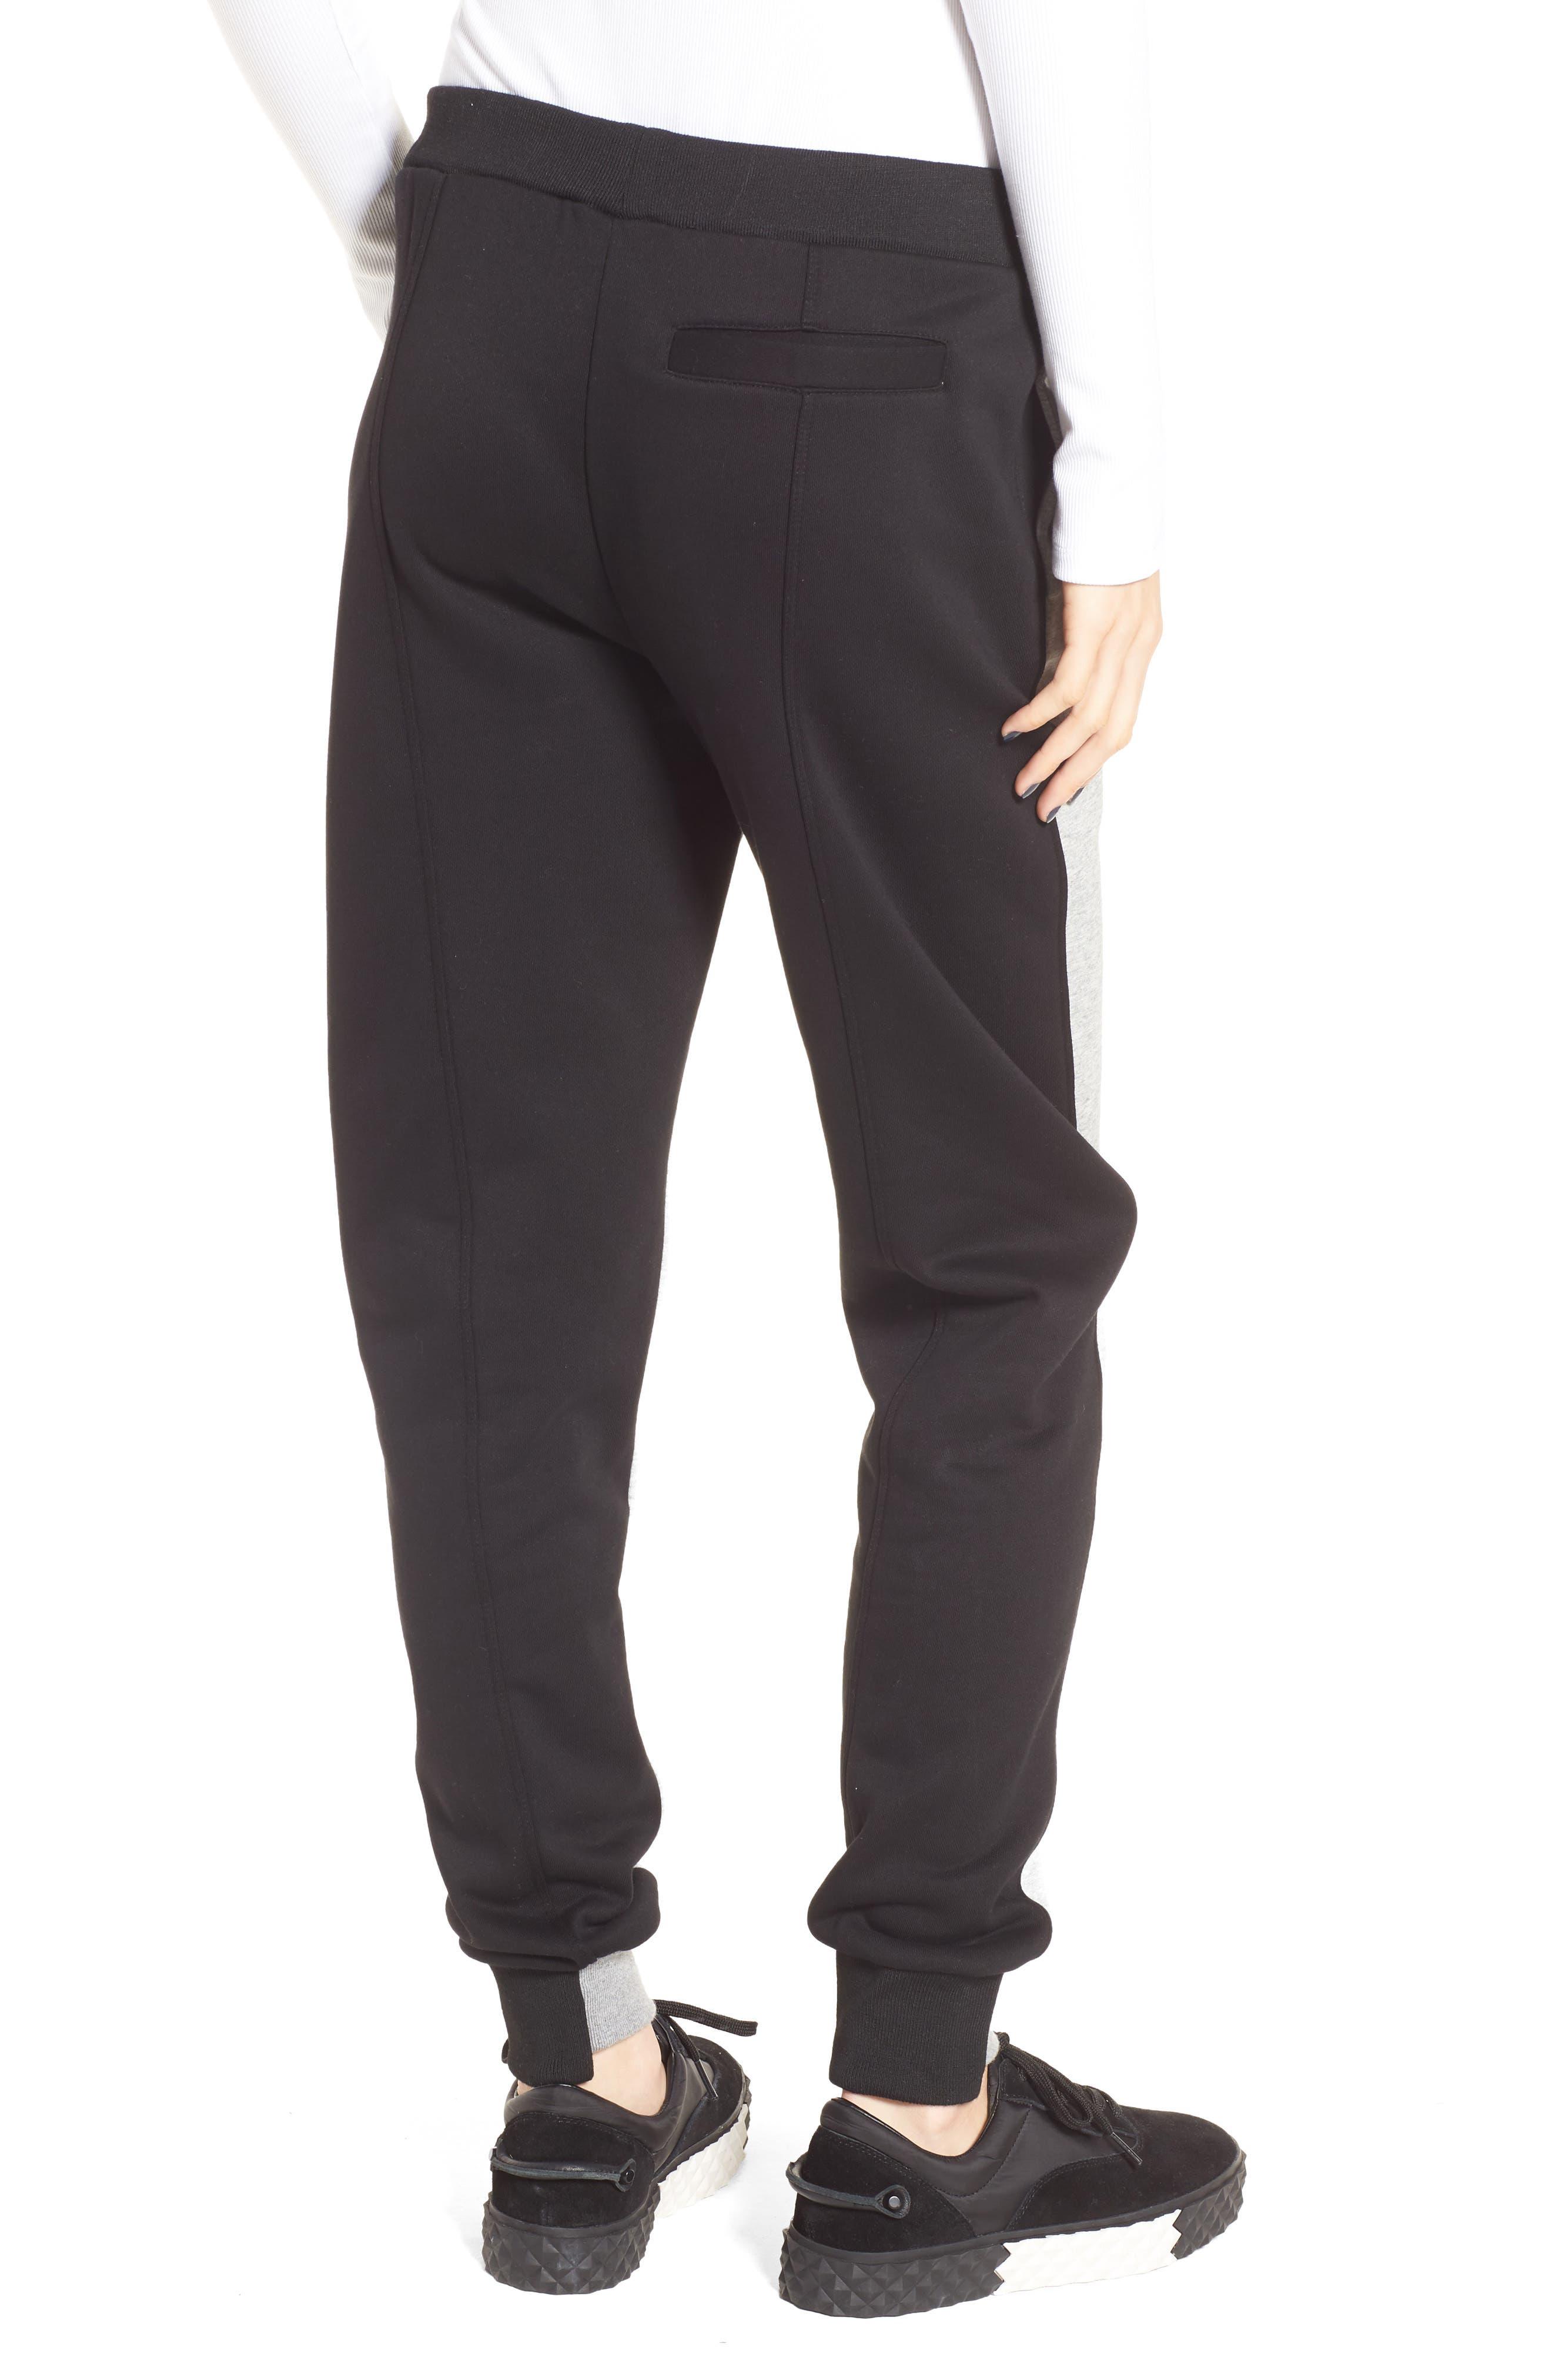 Paneled Sweatpants,                             Alternate thumbnail 2, color,                             Black/ Med. Heather Grey